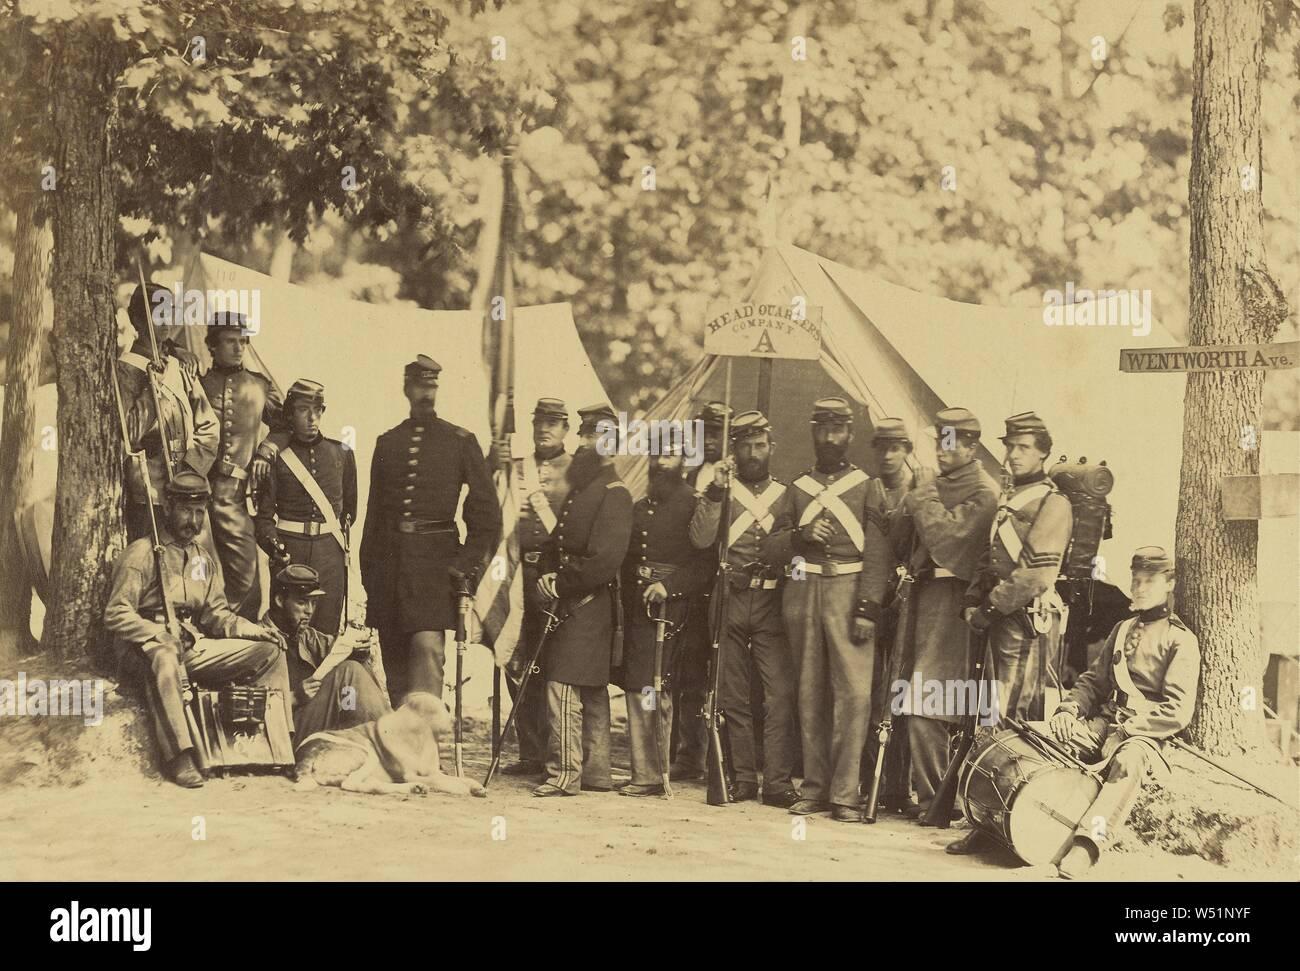 1861-Civil War Photo Engineer Company 12th New York State Militia-Camp Anderson